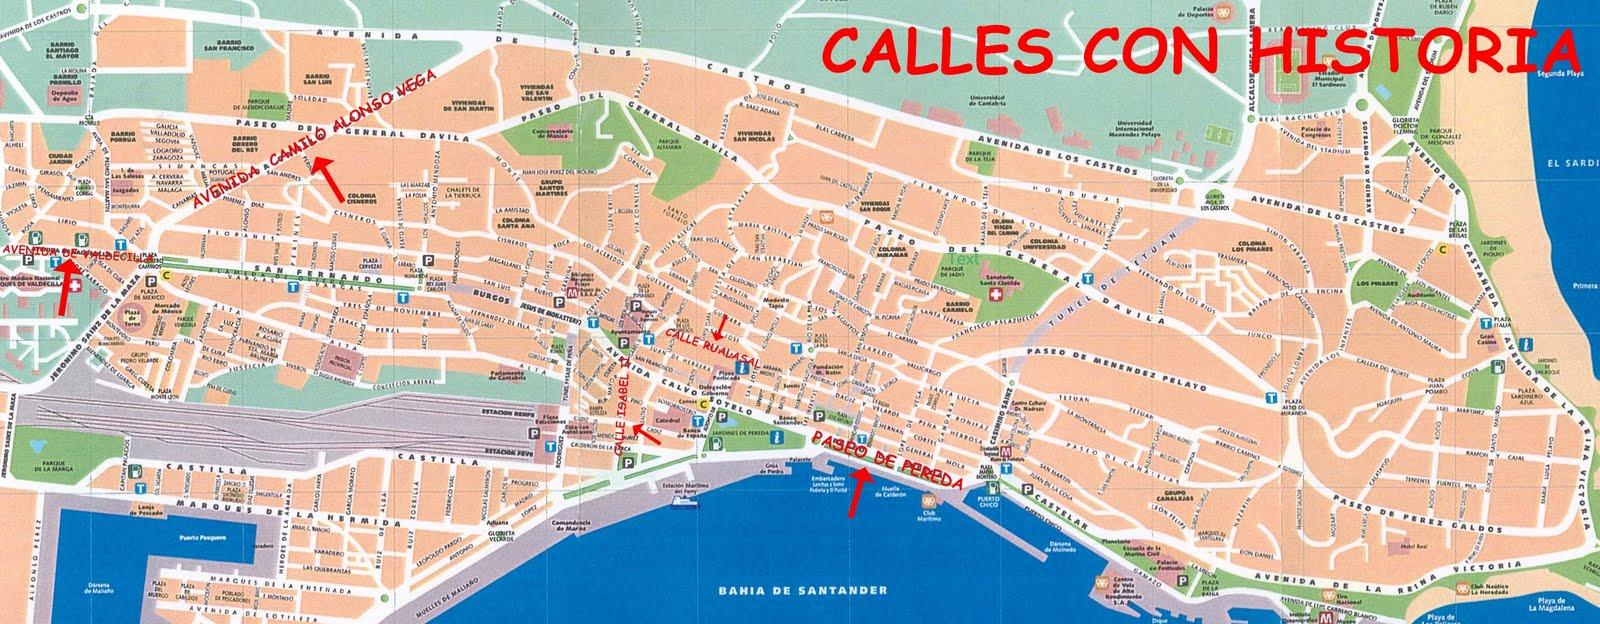 Calles de santander mapa santander i for Mapa santander sucursales